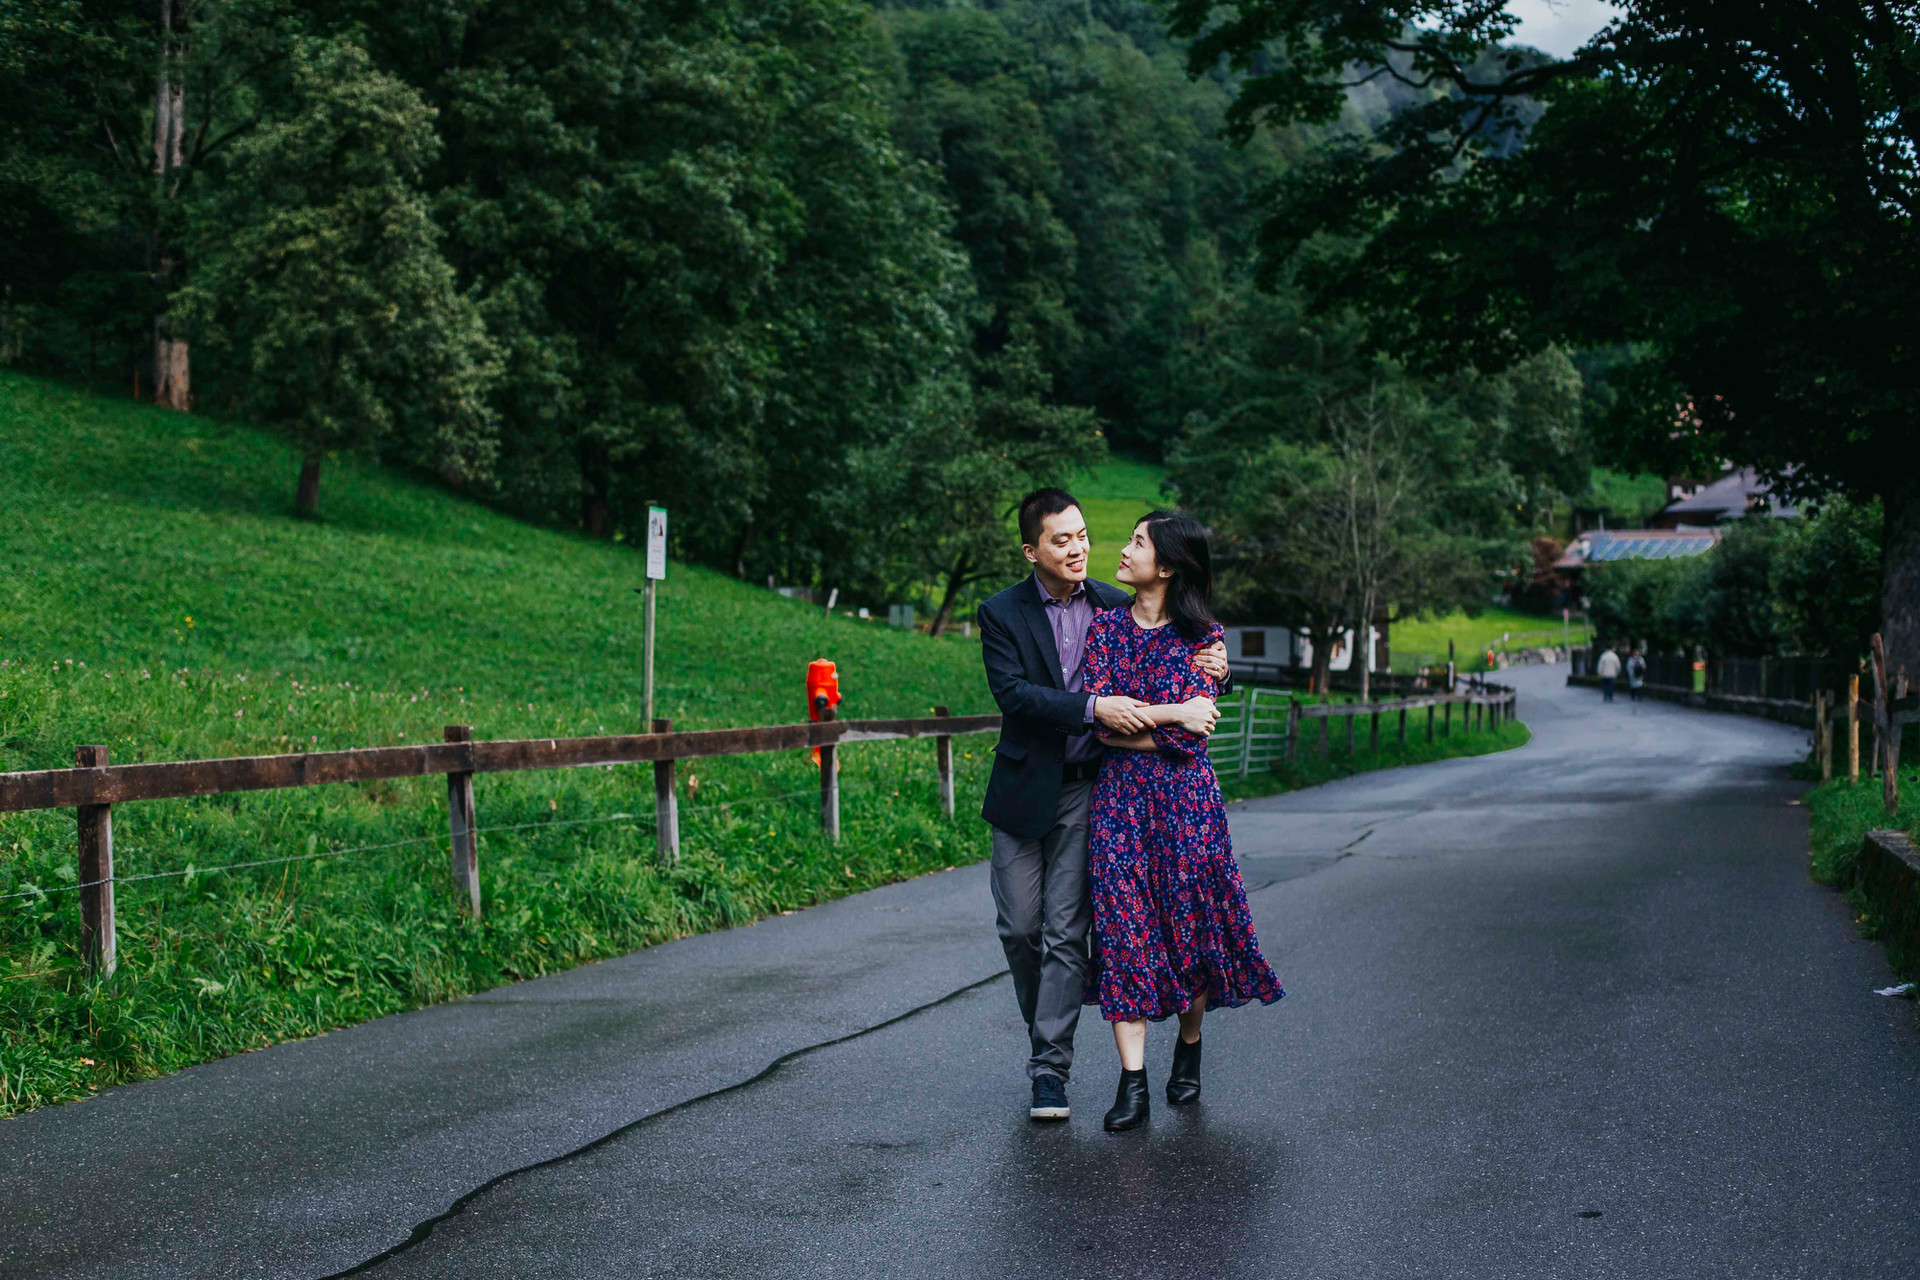 Lauterbrunnen photo session-5.jpg